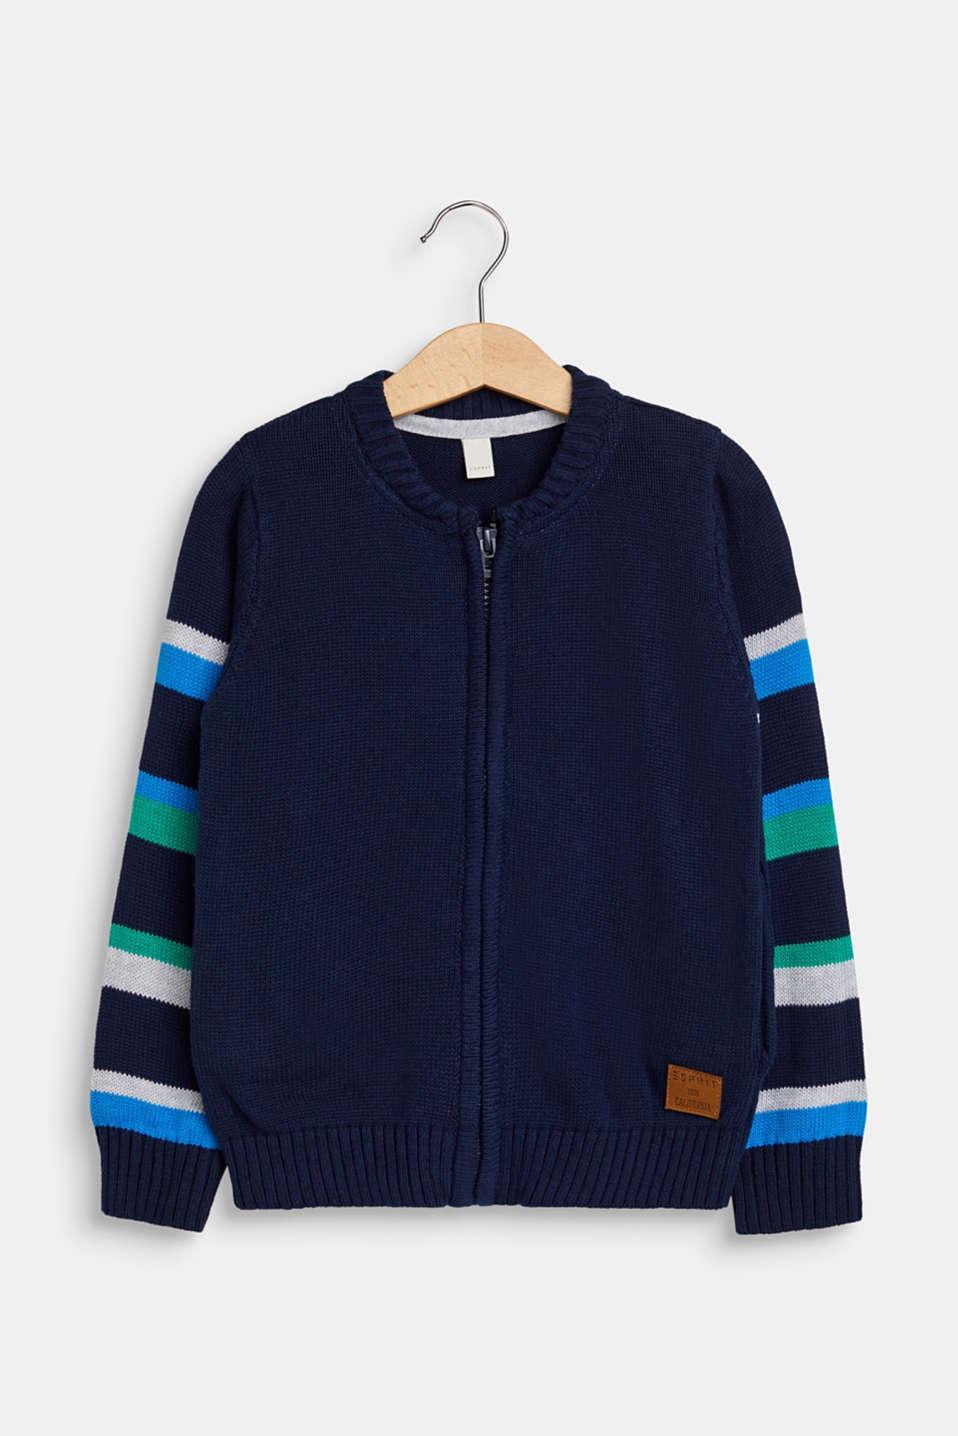 Striped zip cardigan, 100% cotton, NAVY, detail image number 0